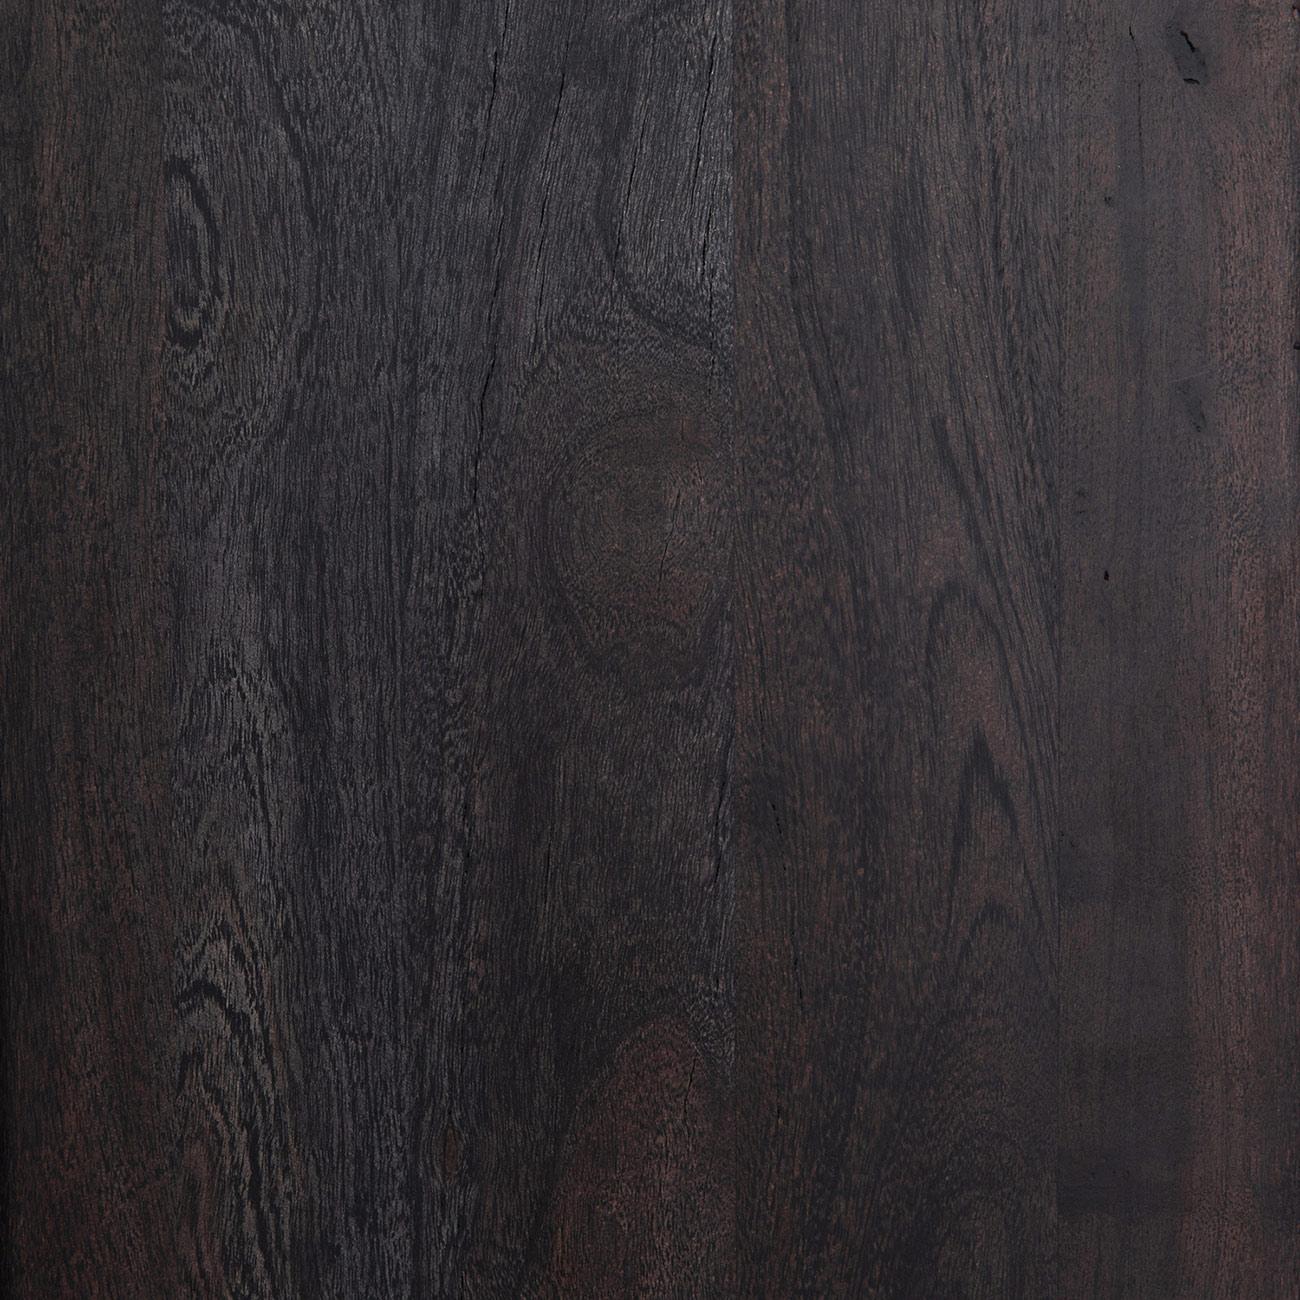 Corazon Global Bazaar Woven Natural Cane Doors Black Wash Acacia Bookcase